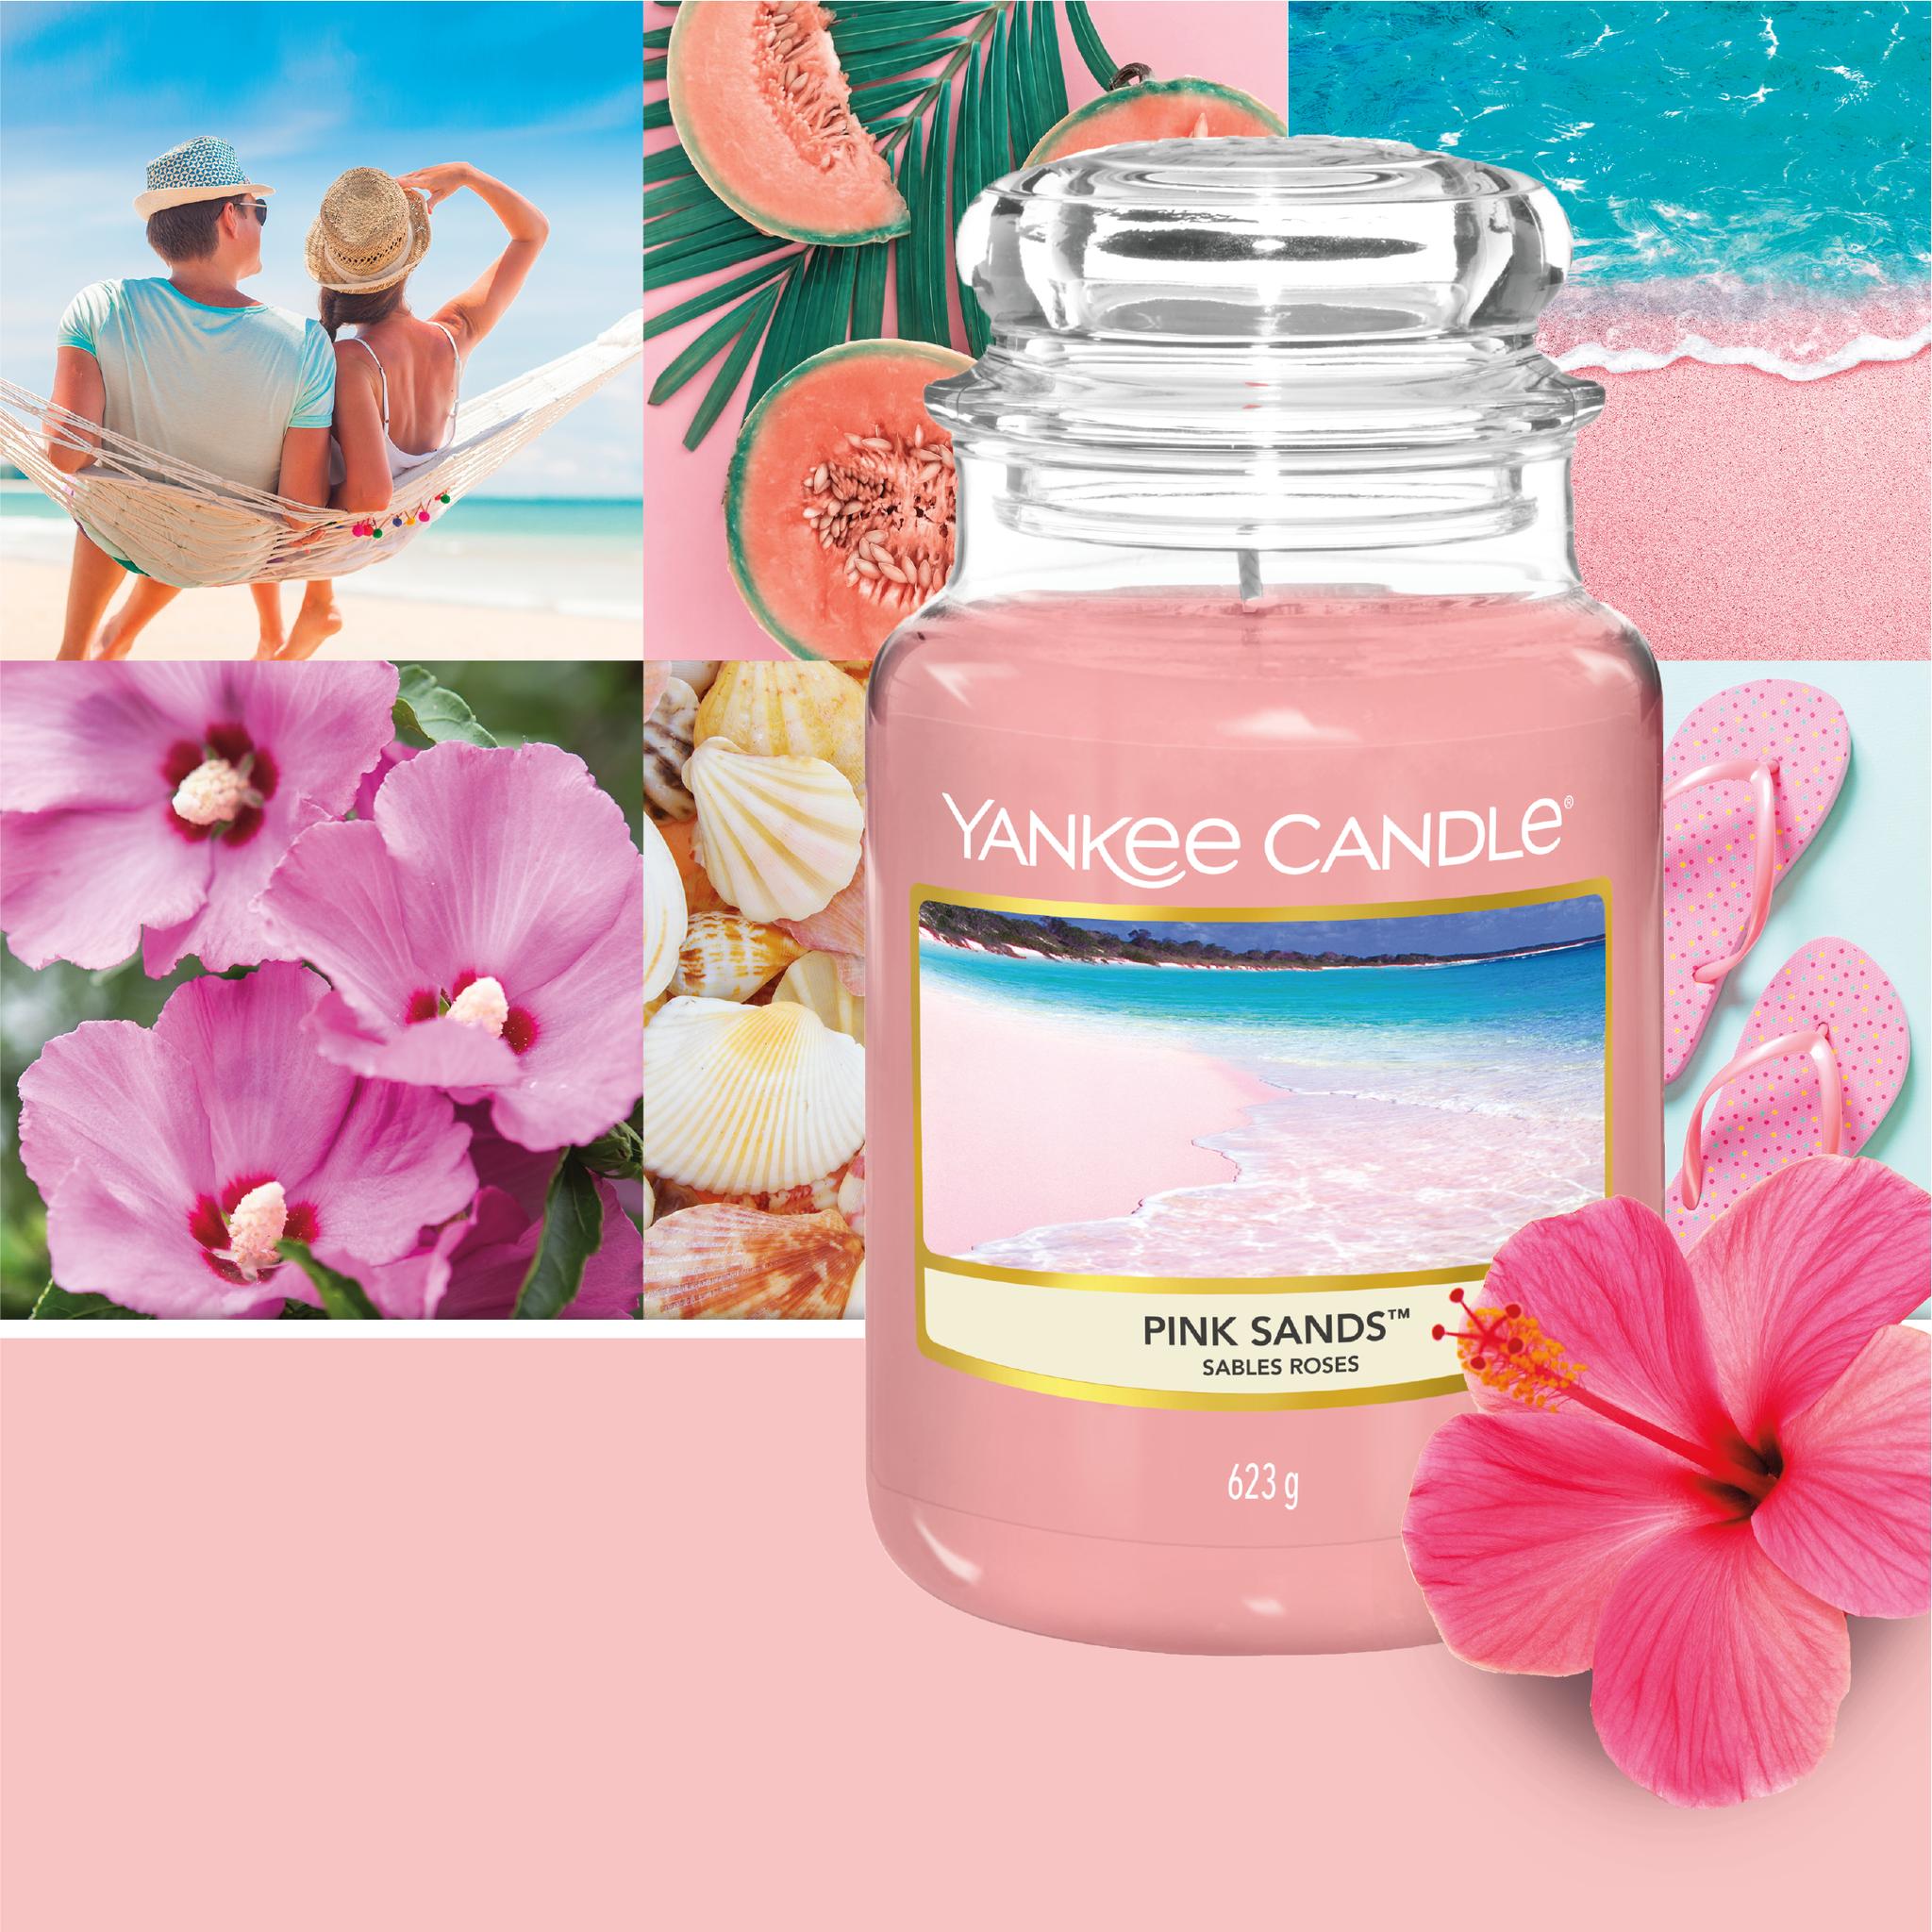 Yankee Candle - Pink Sands Large Jar